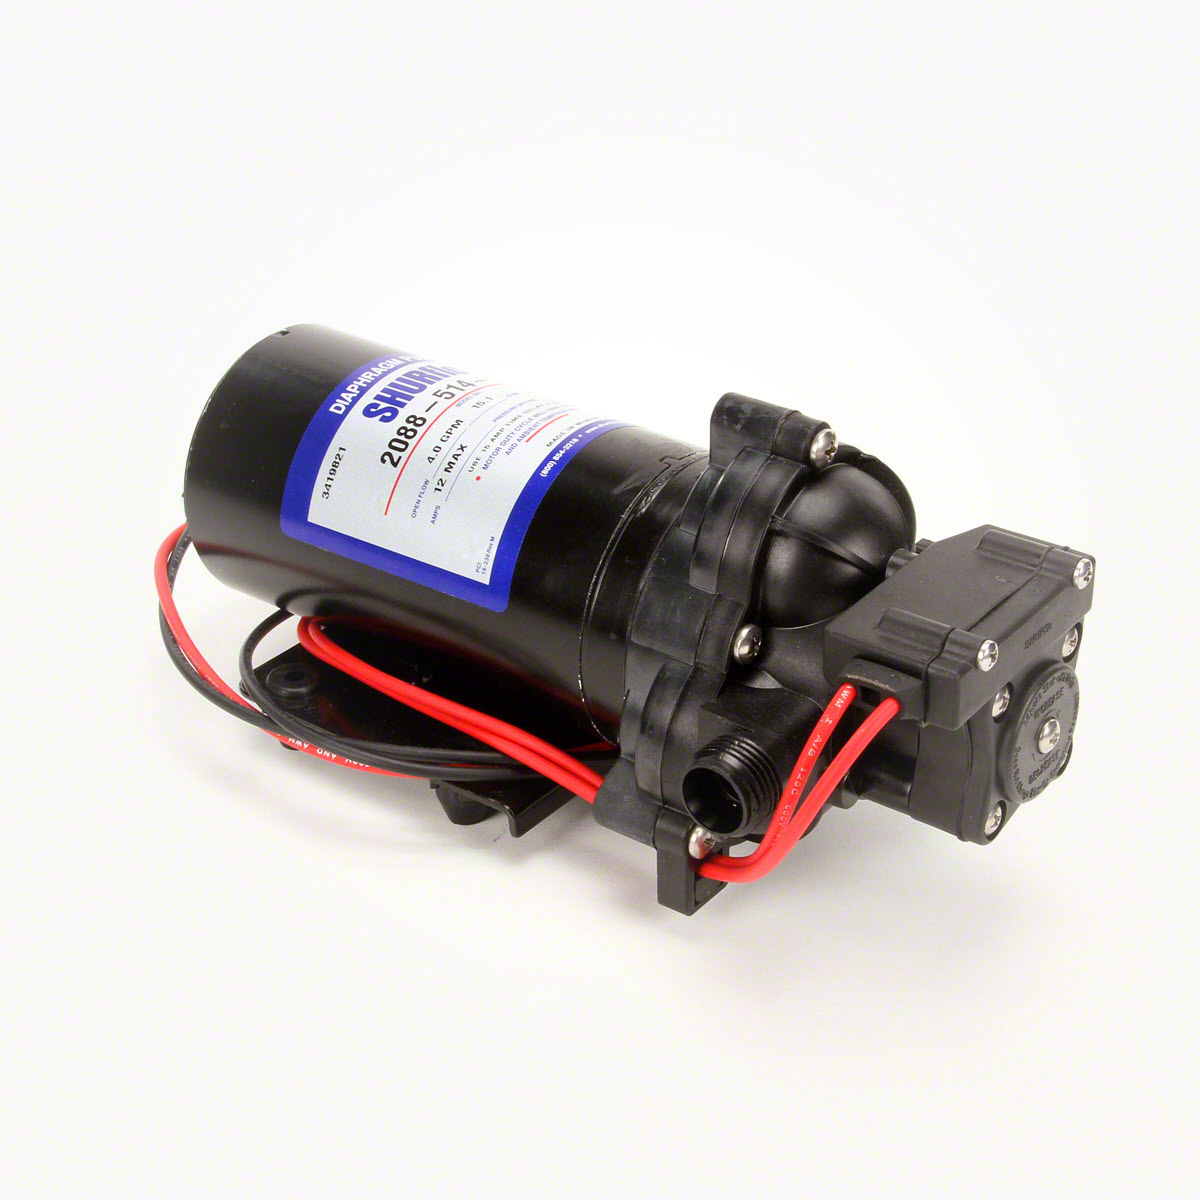 Shurflo 8000 sprayer pumps for agriculture sprayers rvs shurflo 3 gpm 3 chamber diaphragm pump pooptronica